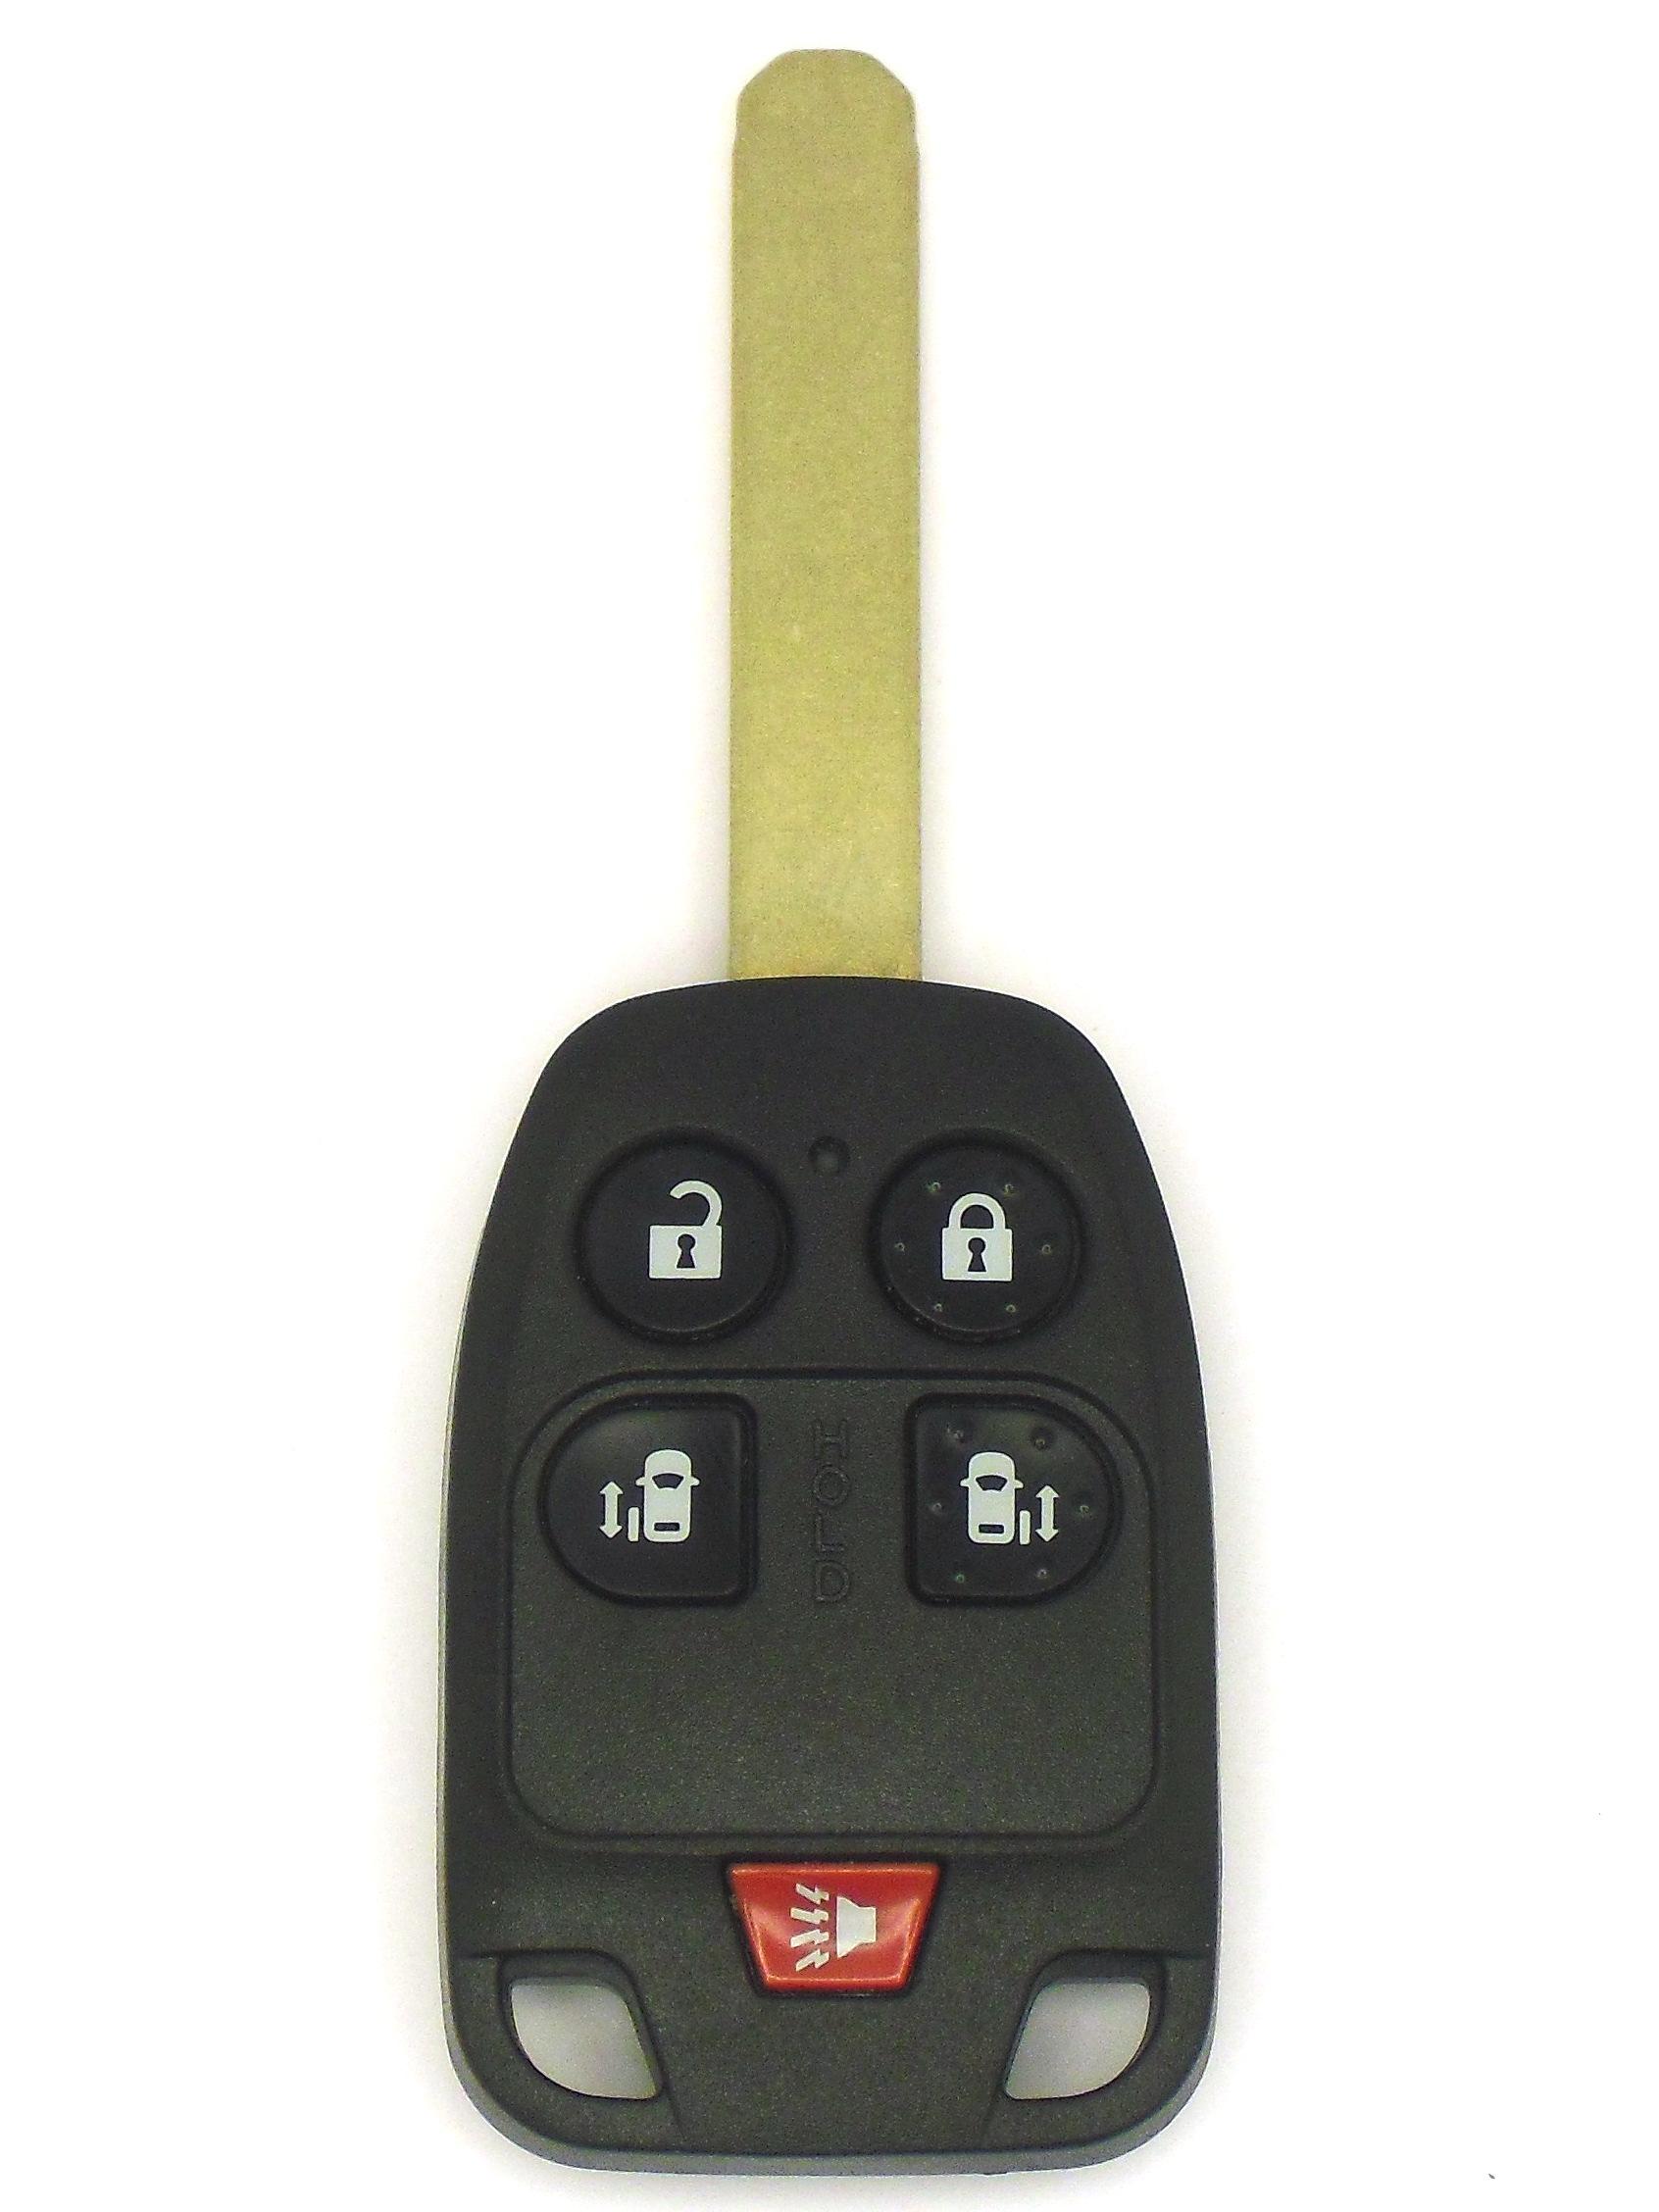 Honda Odyssey Remote Amp Key Combo 5 Button For 2012 Honda